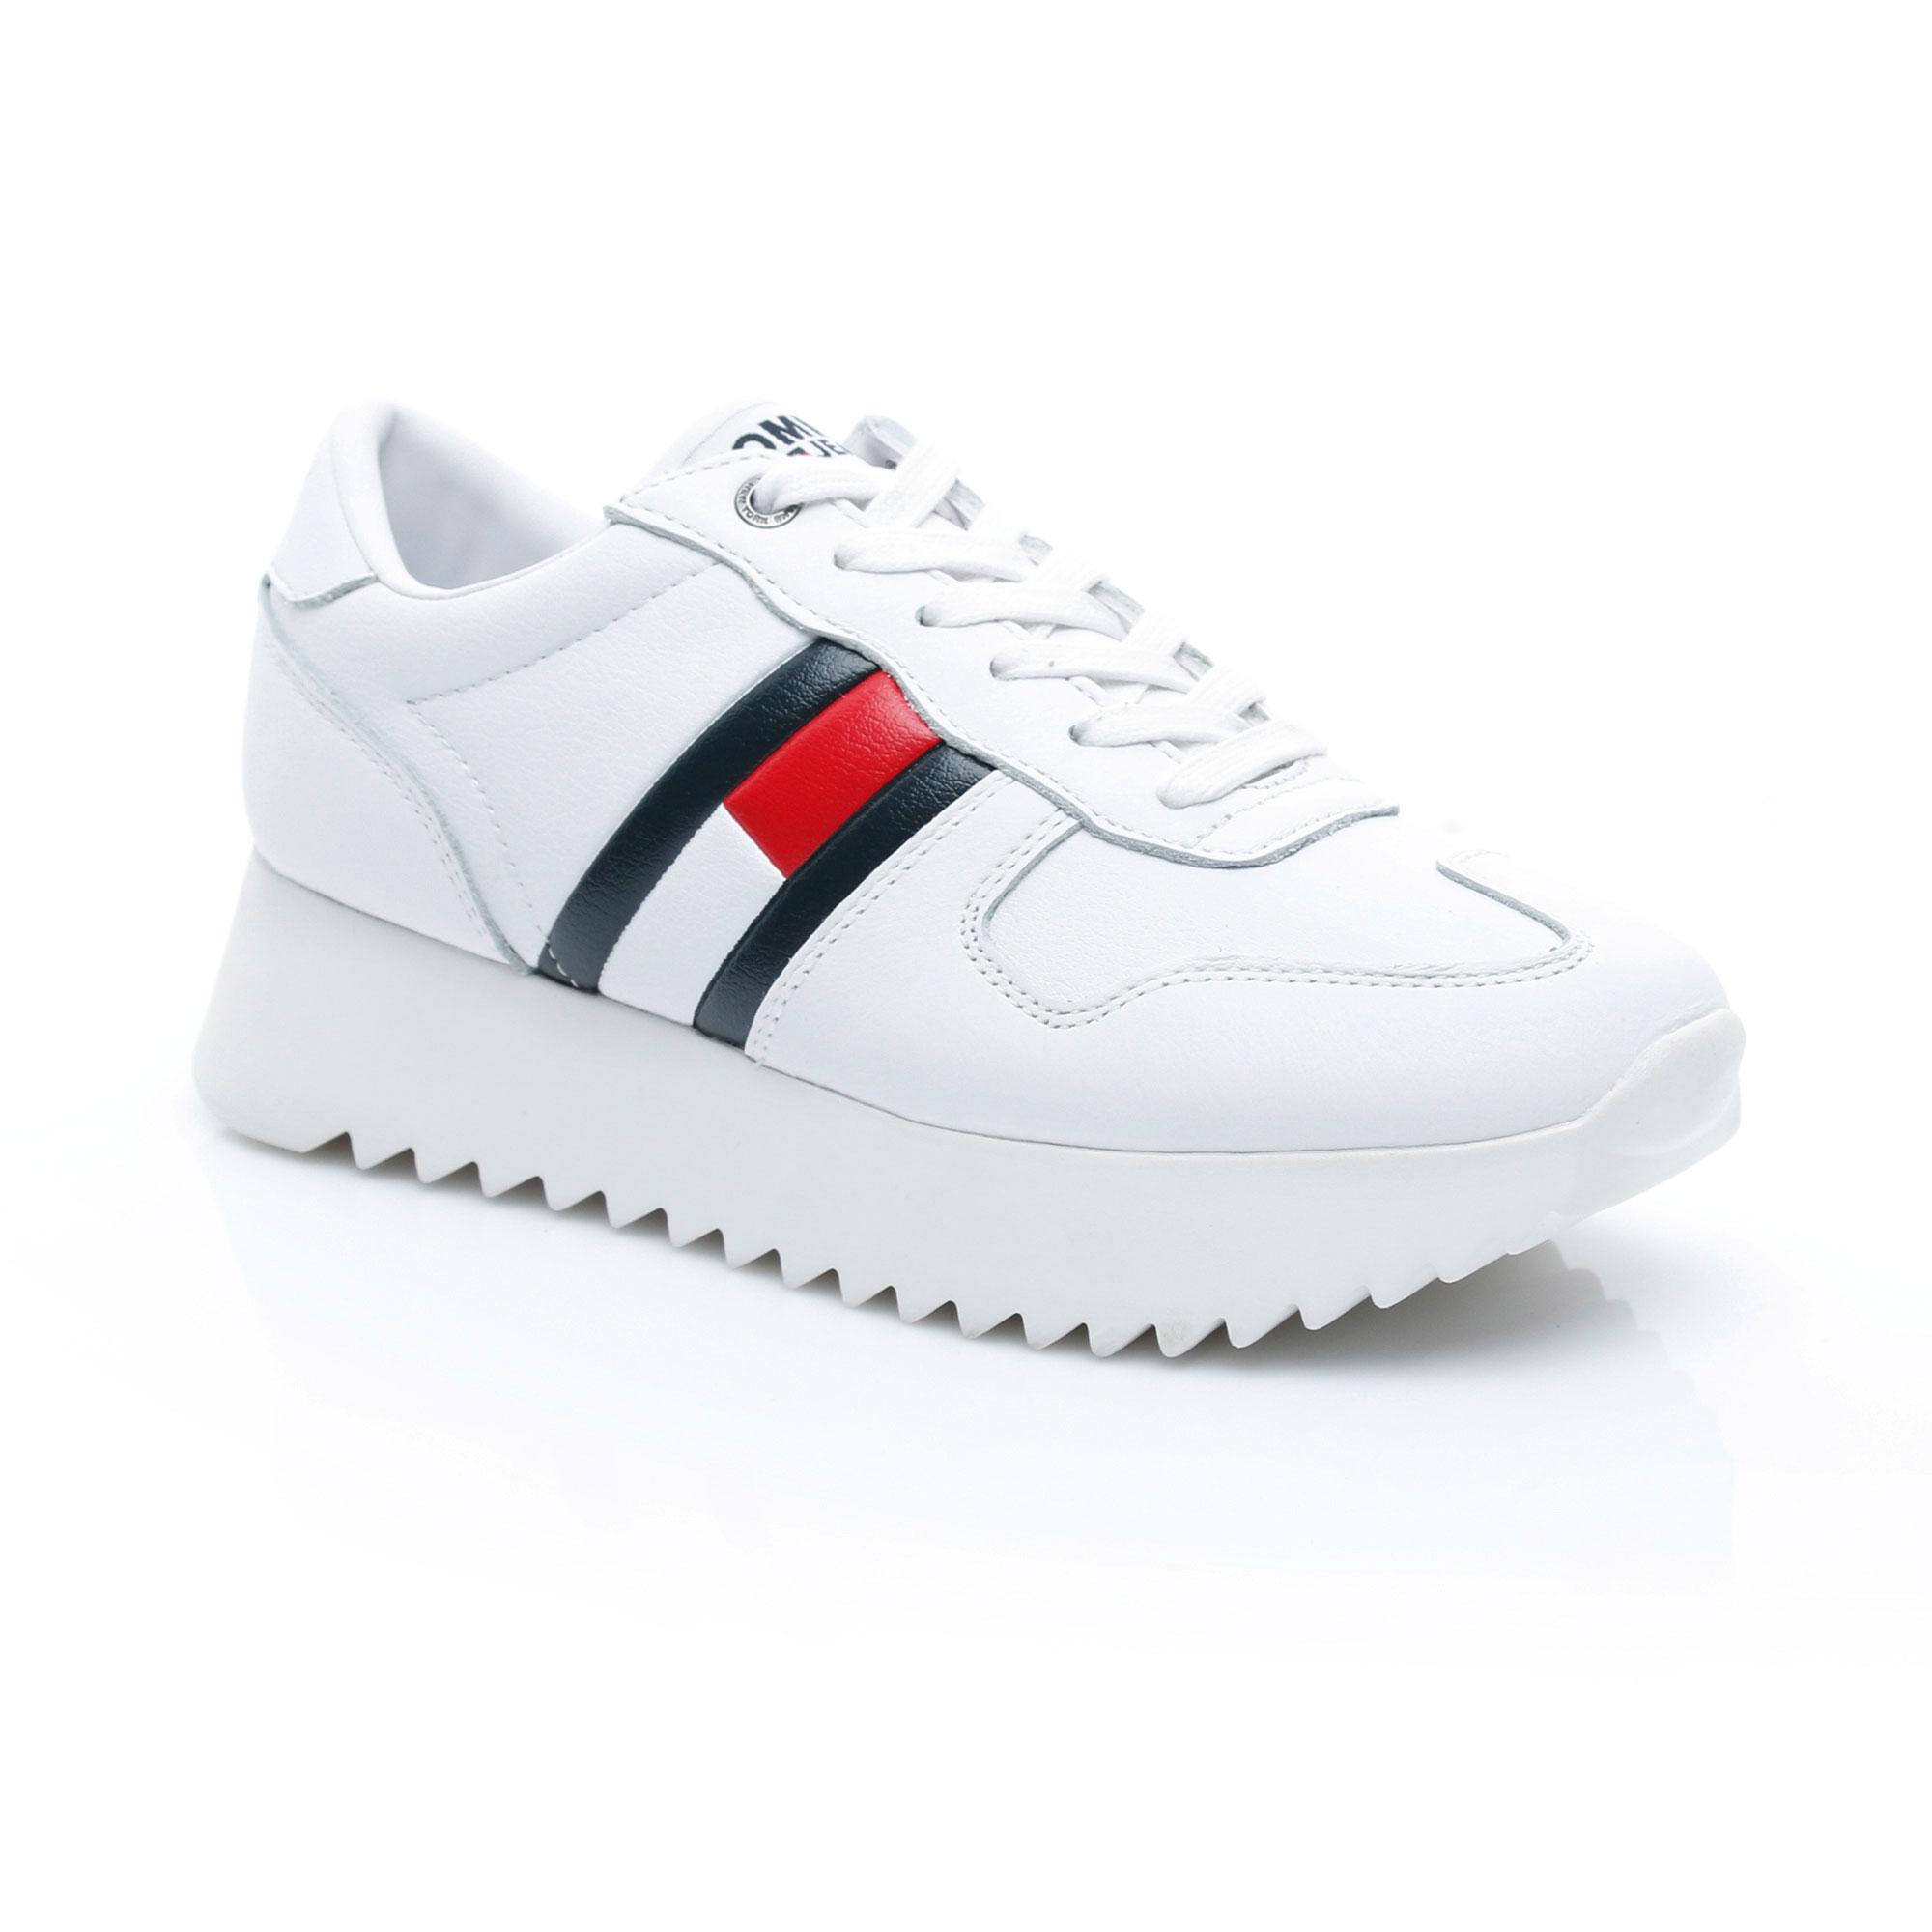 Tommy Hilfiger High Cleated Kadın Beyaz Sneaker